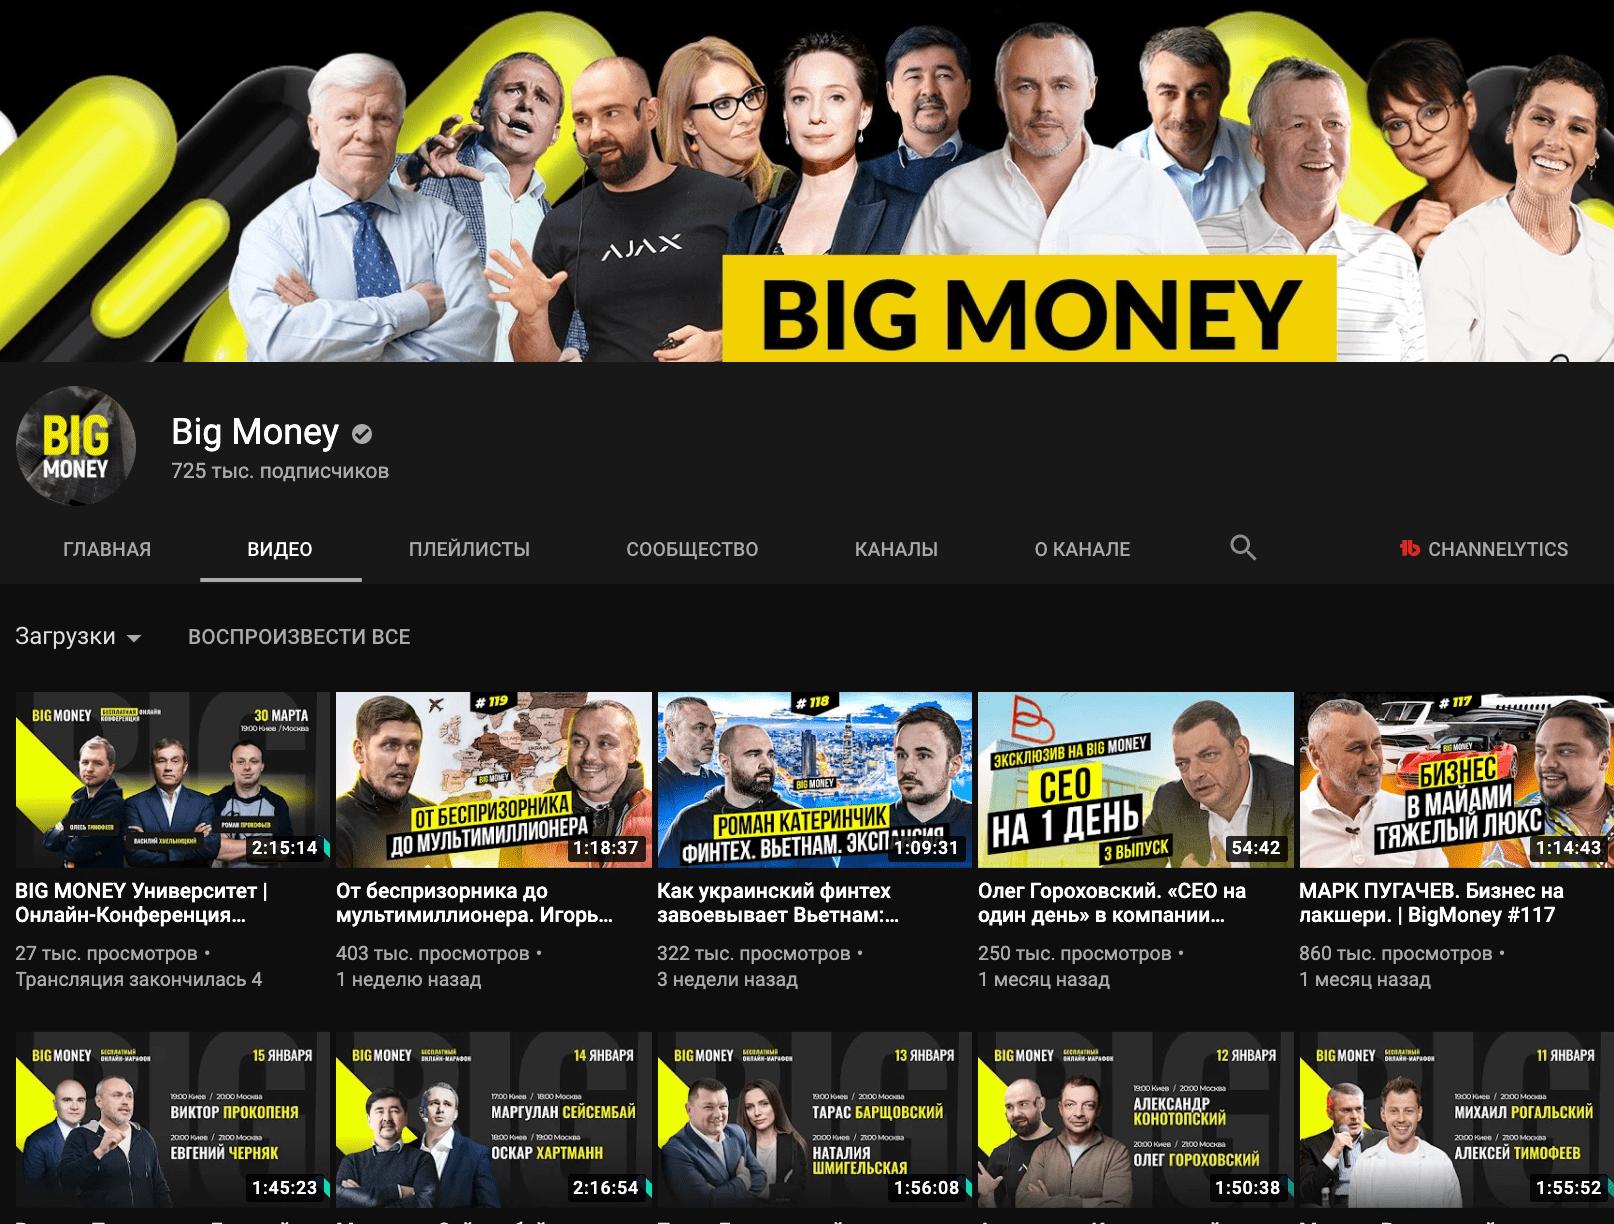 YouTube-канал проекта Big Money